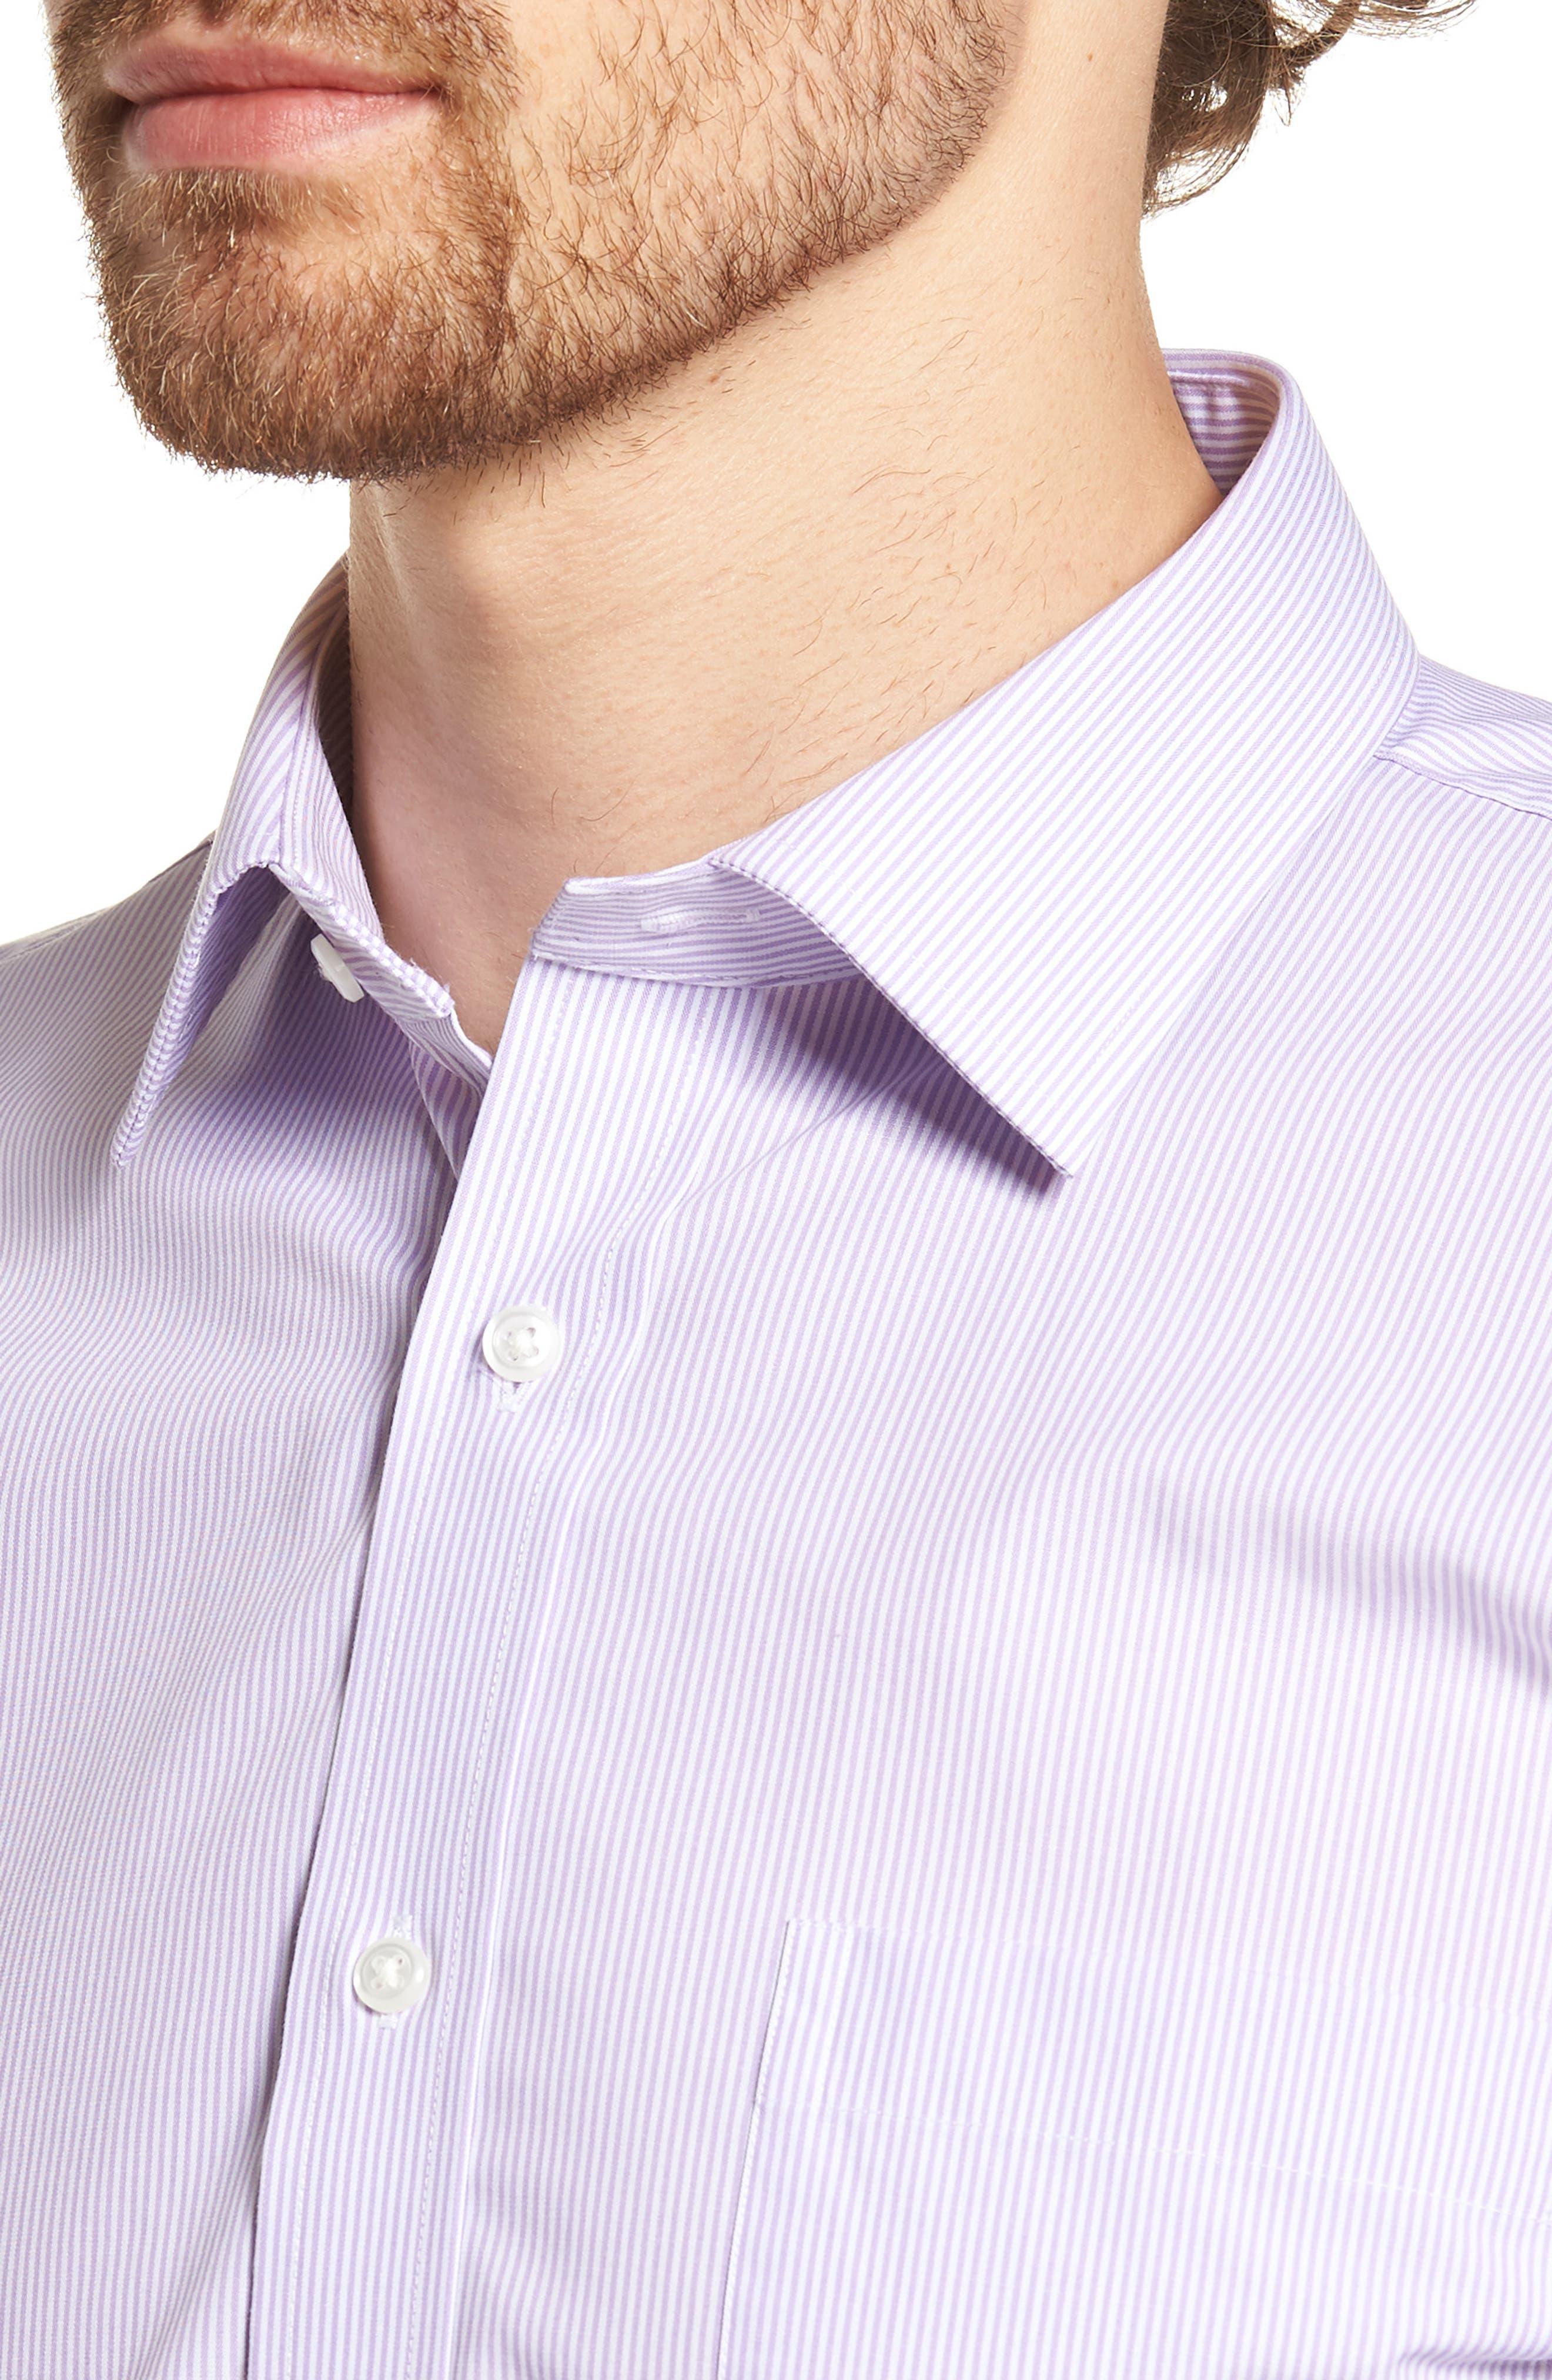 Trim Fit Non-Iron Stripe Dress Shirt,                             Alternate thumbnail 10, color,